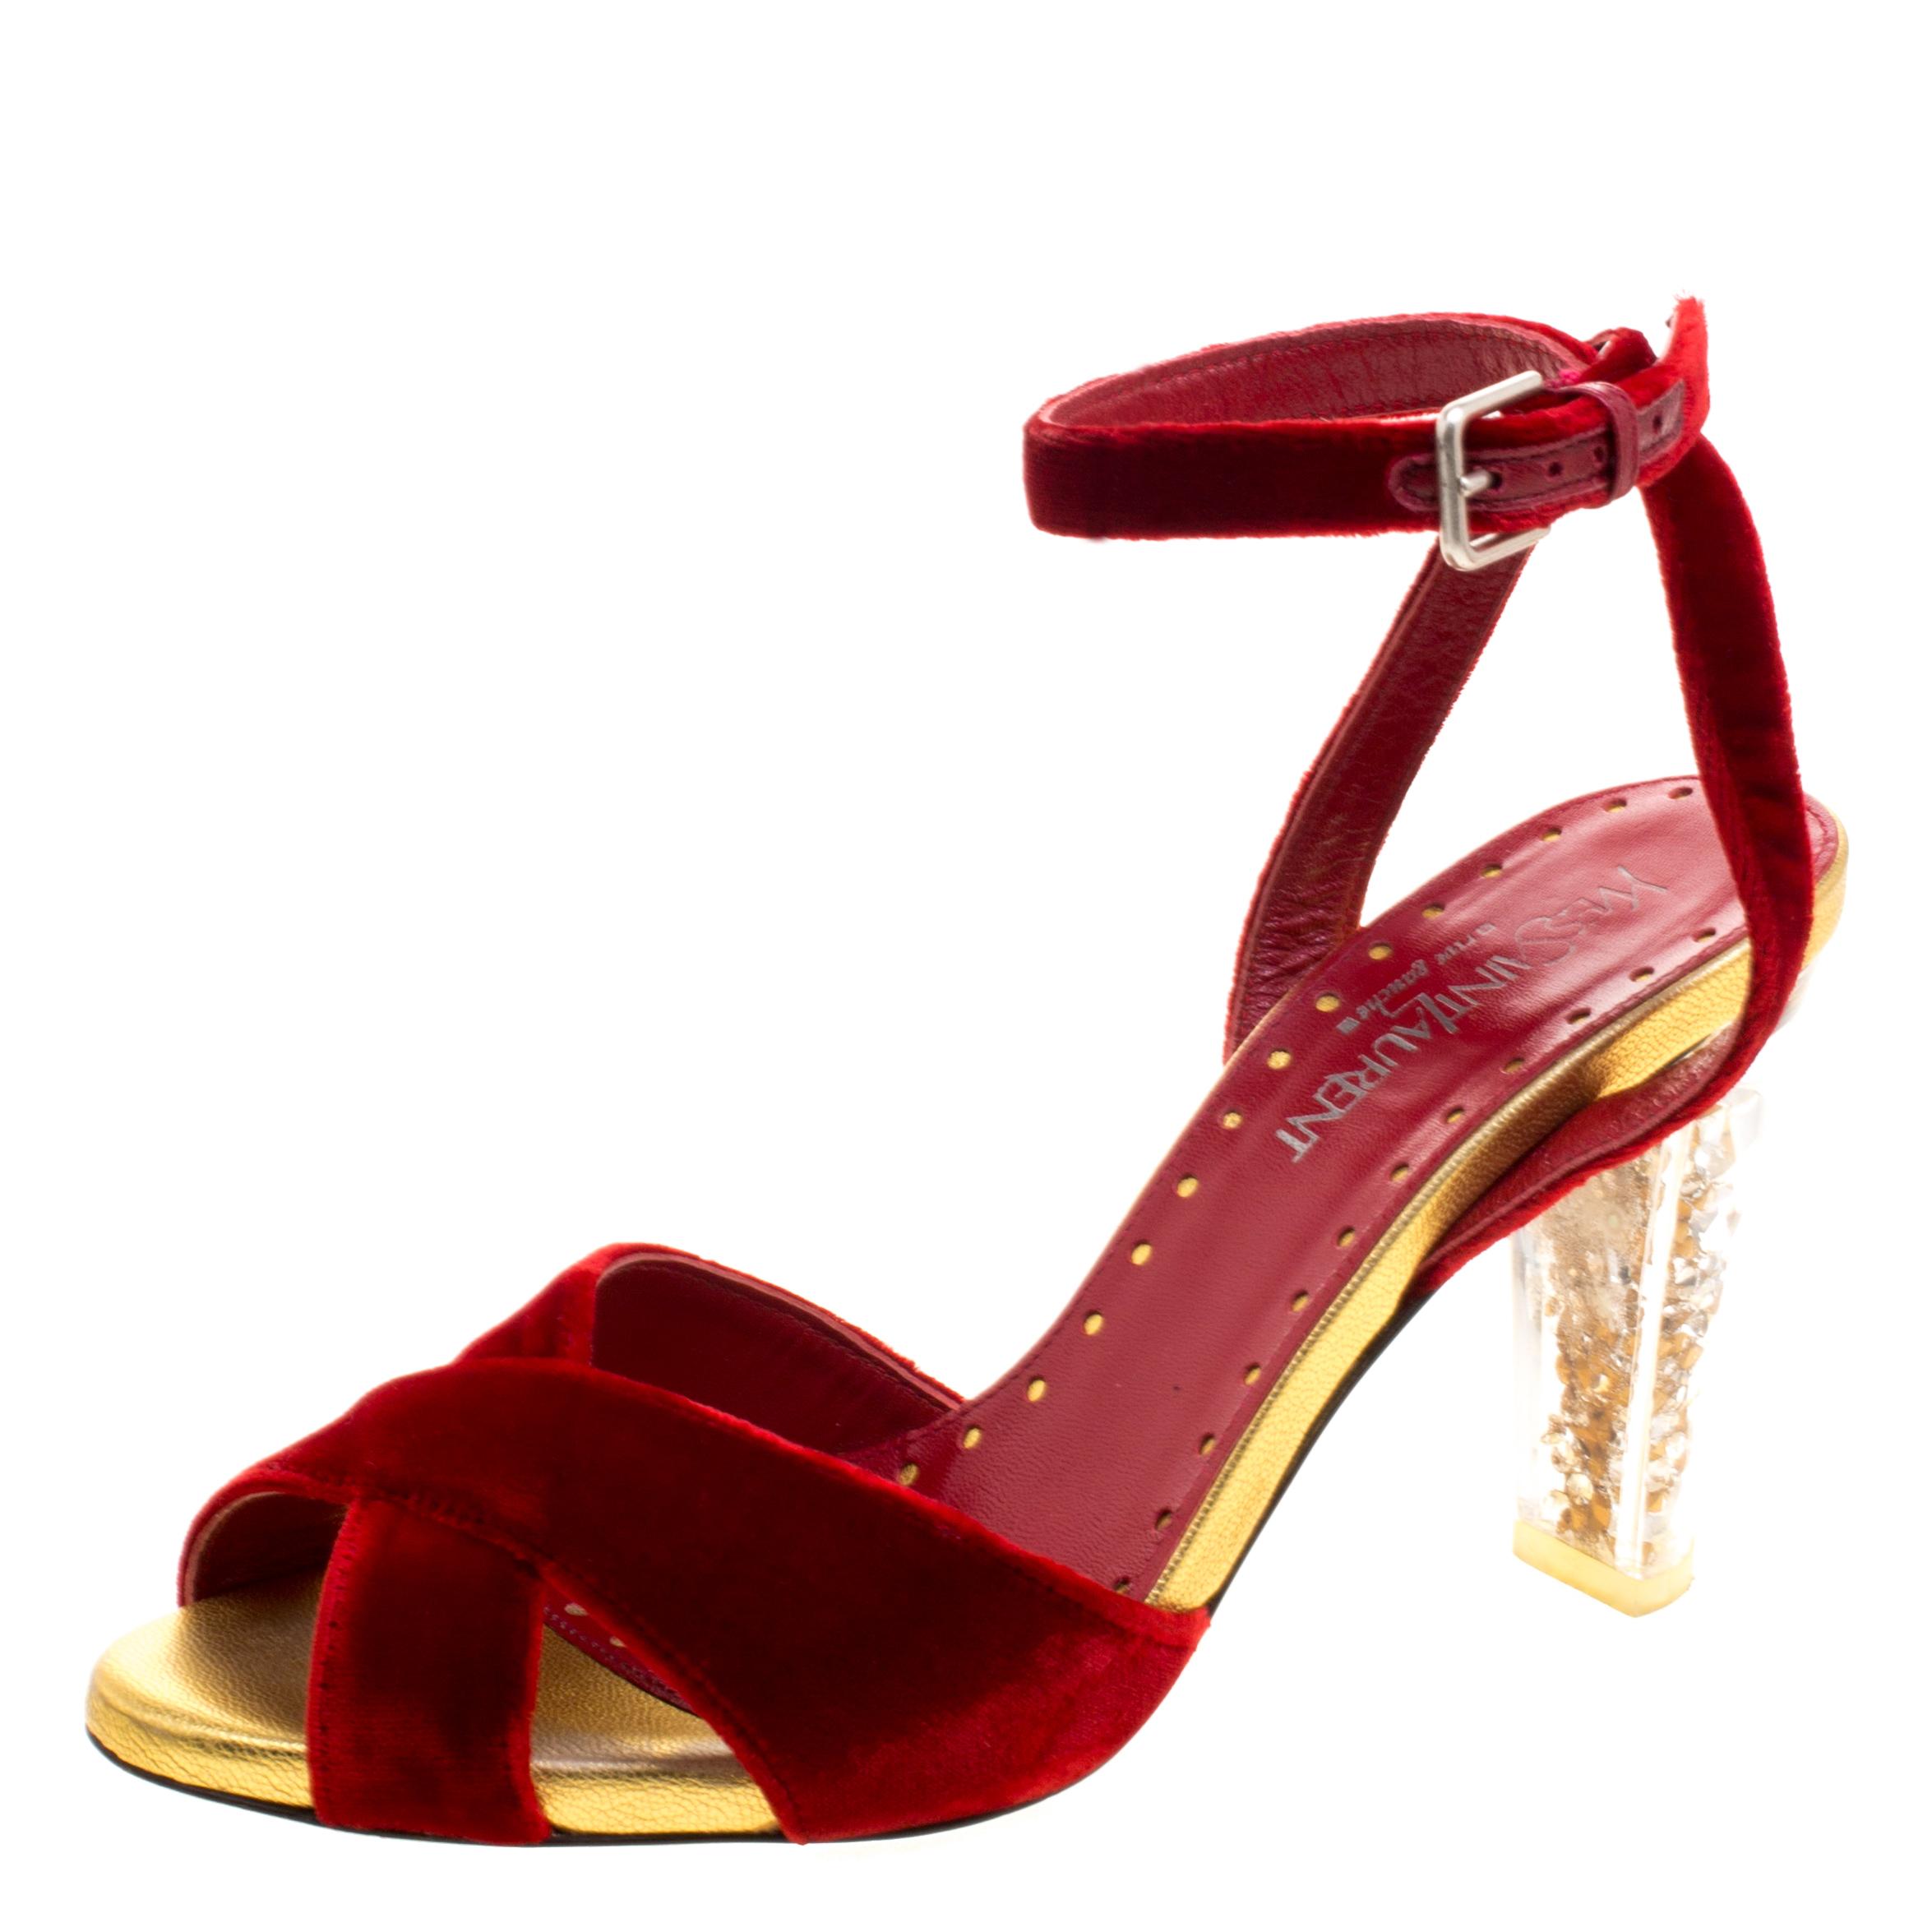 026e5355a5c ... Red Velvet Embellished Heel Cross Ankle Strap Sandals Size 37.5.  nextprev. prevnext